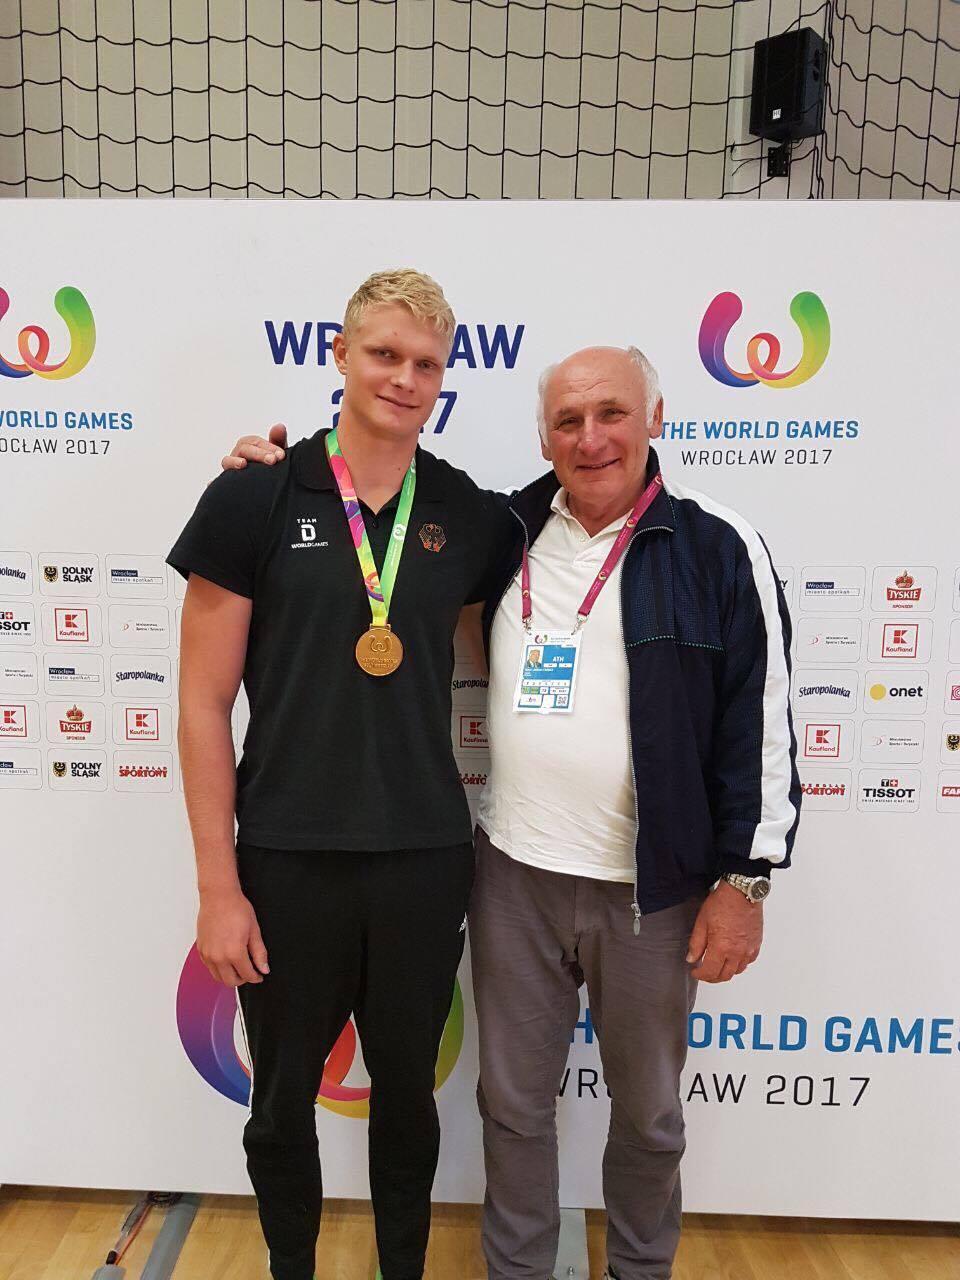 Oliver Zeidler, Johann Färber, World Games 2017, Breslau